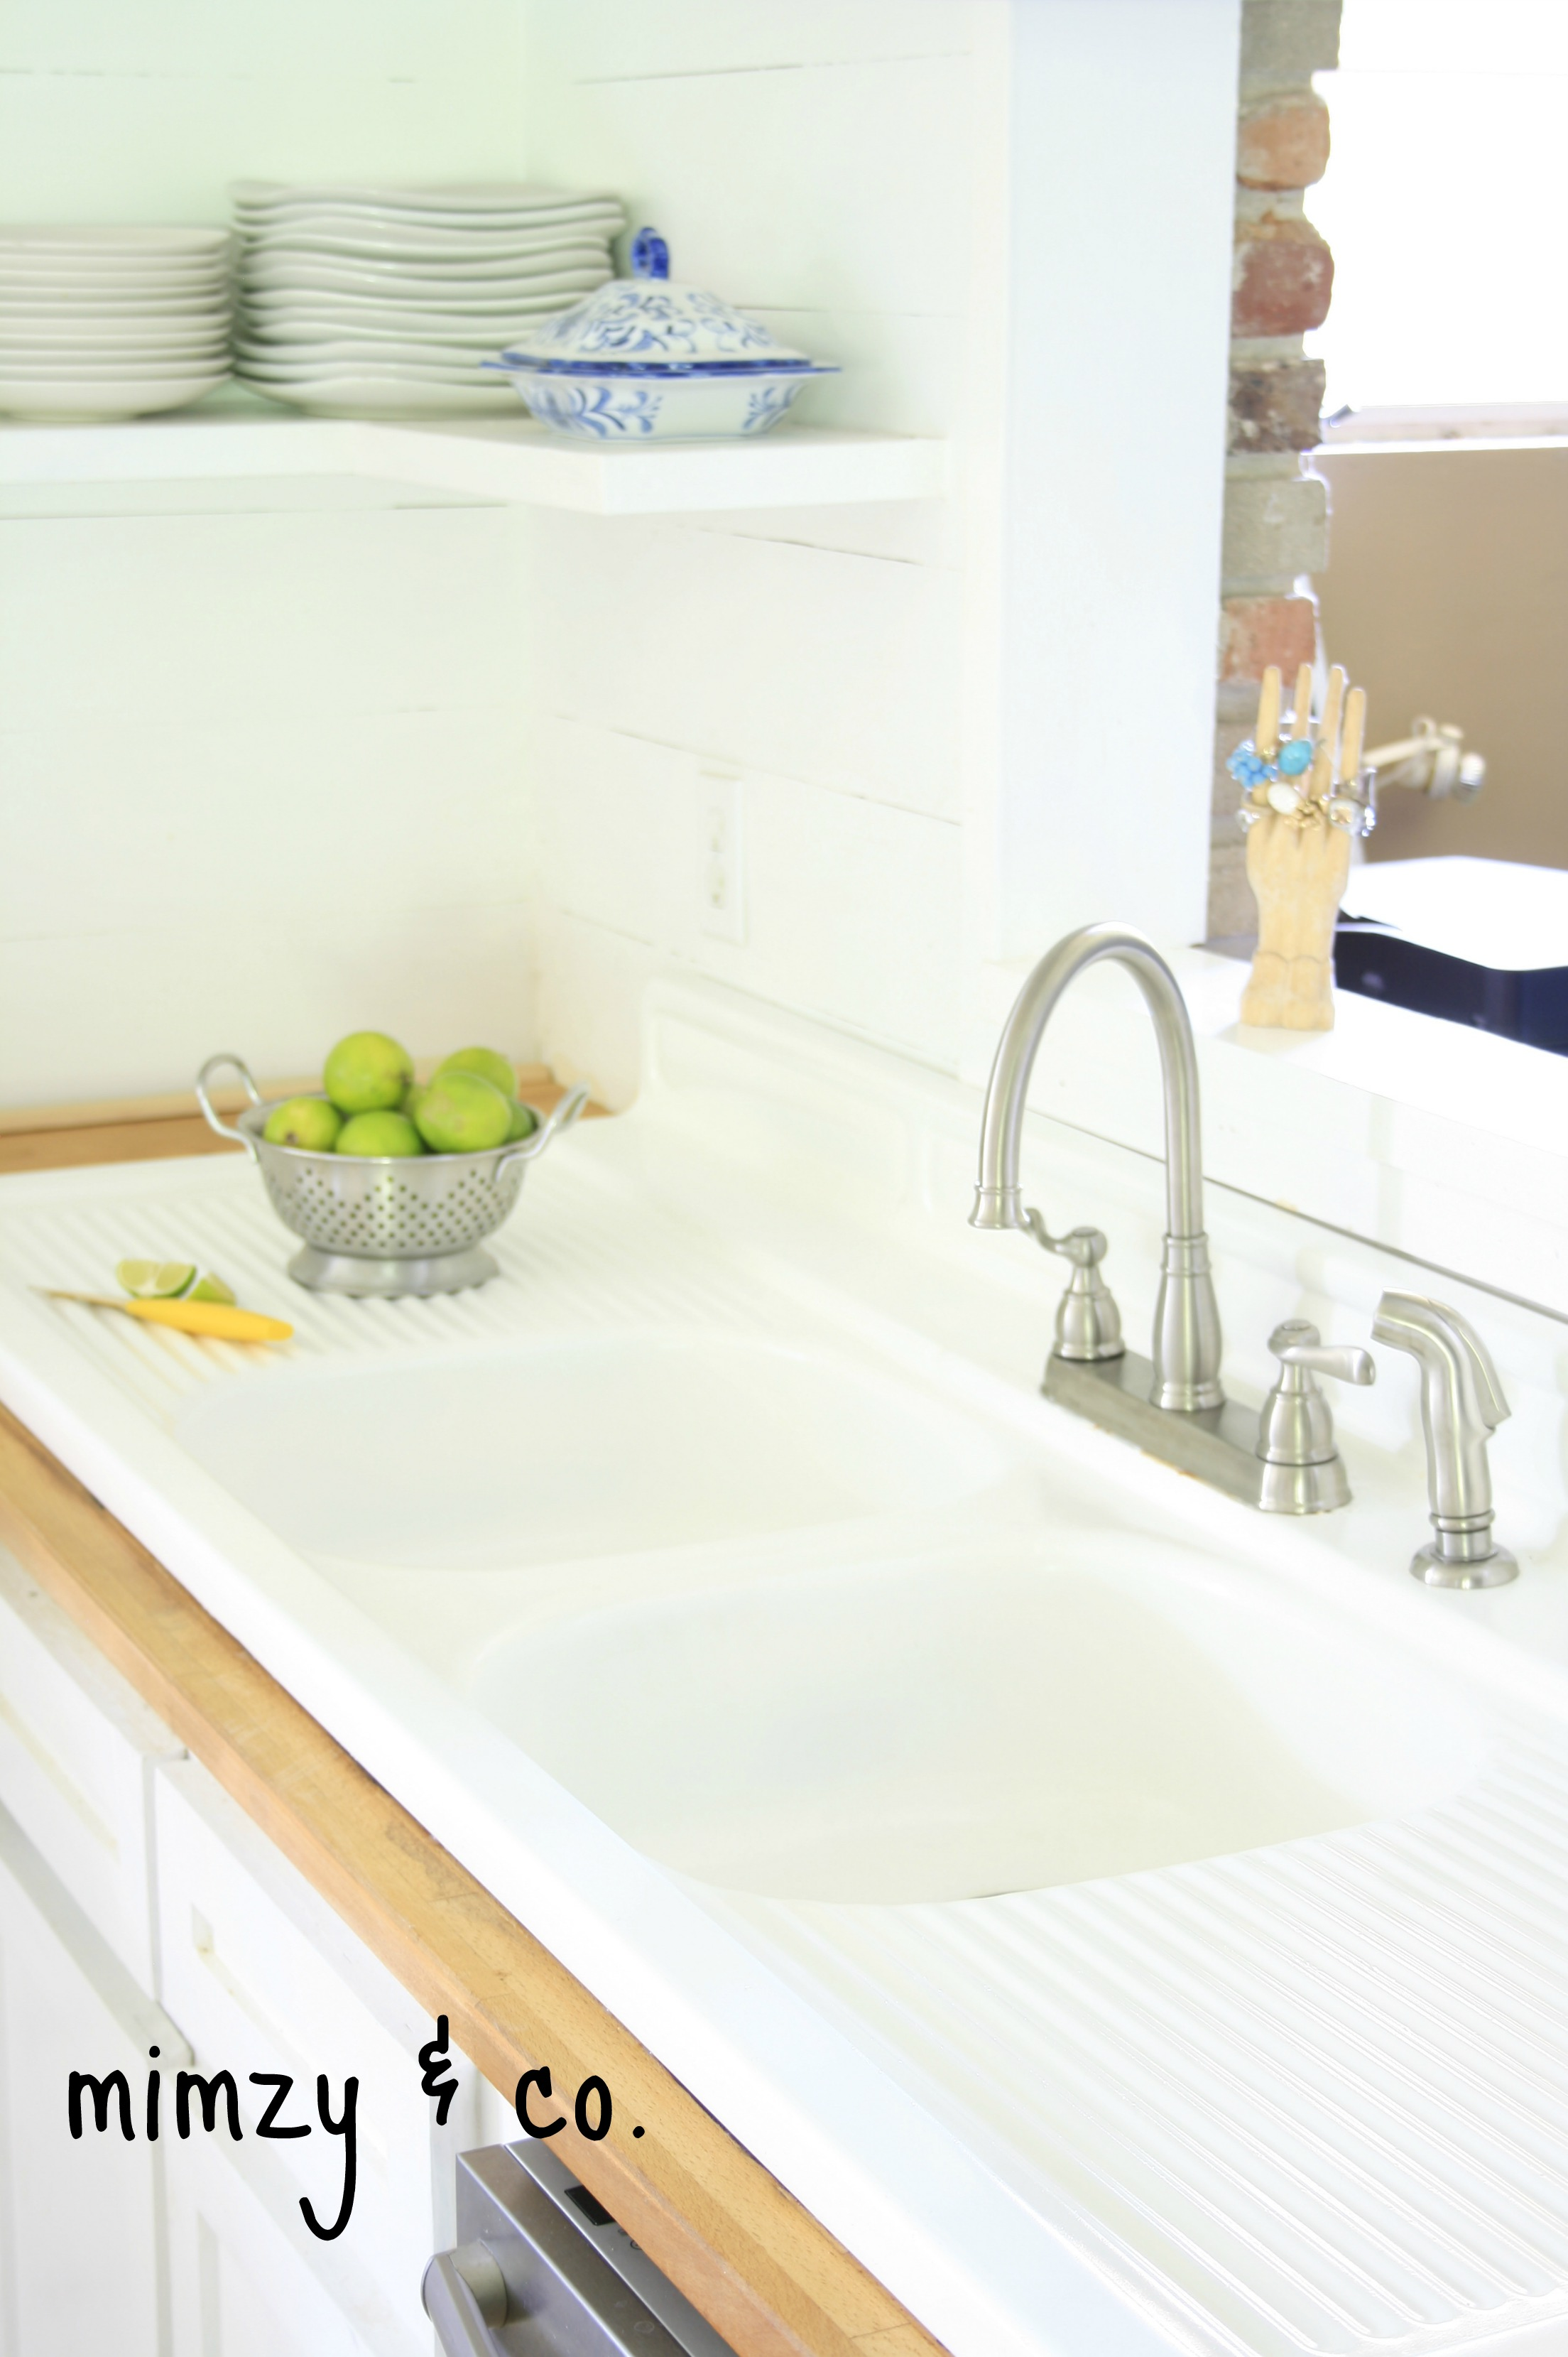 refinish kitchen sink cheap decor how i refinished my vintage cast iron mimzy company sinkrefinished